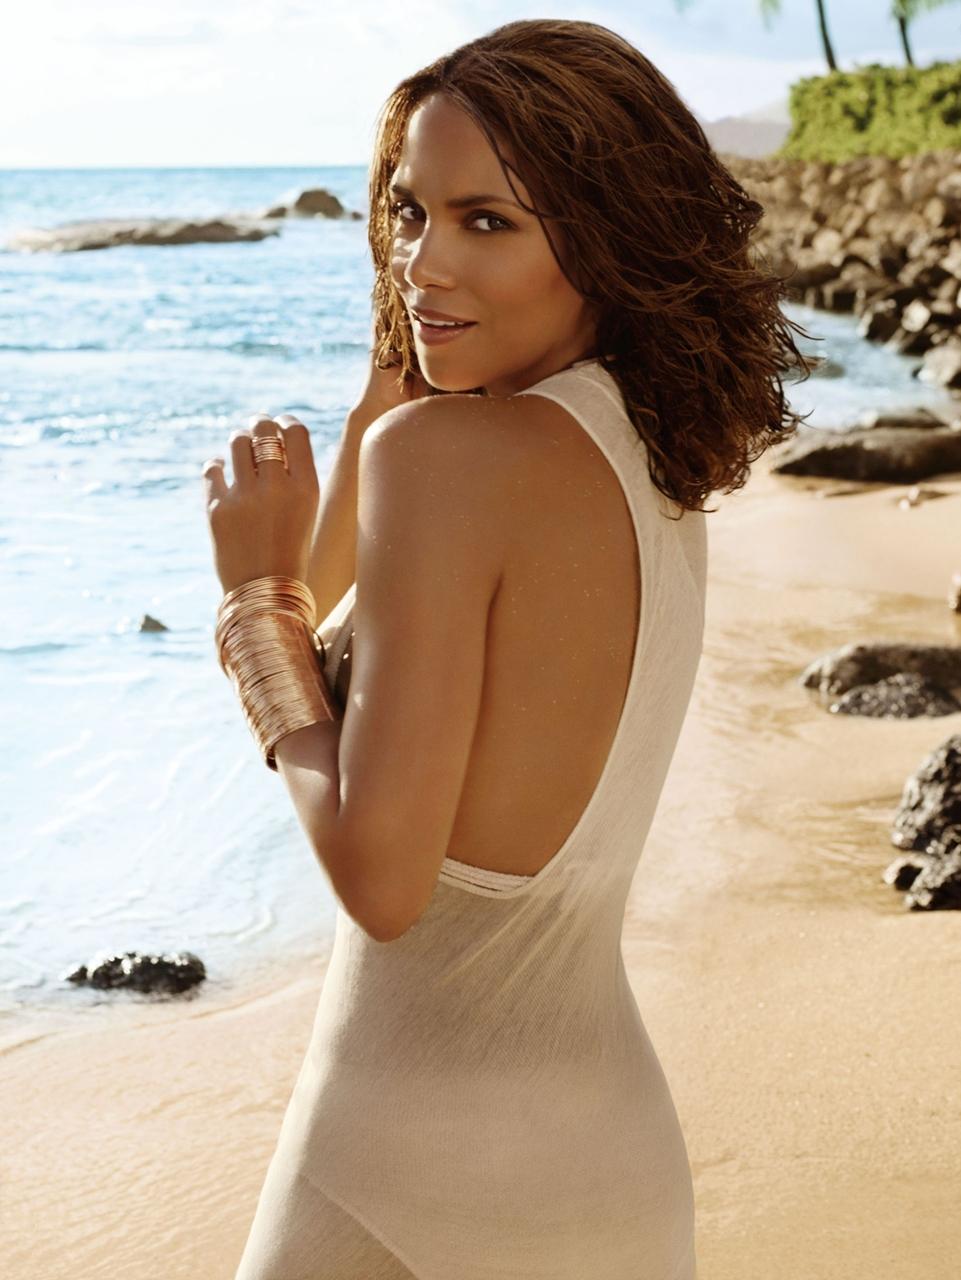 10-Beauty-Secrets-for-Women-from-the-Celebrities-2